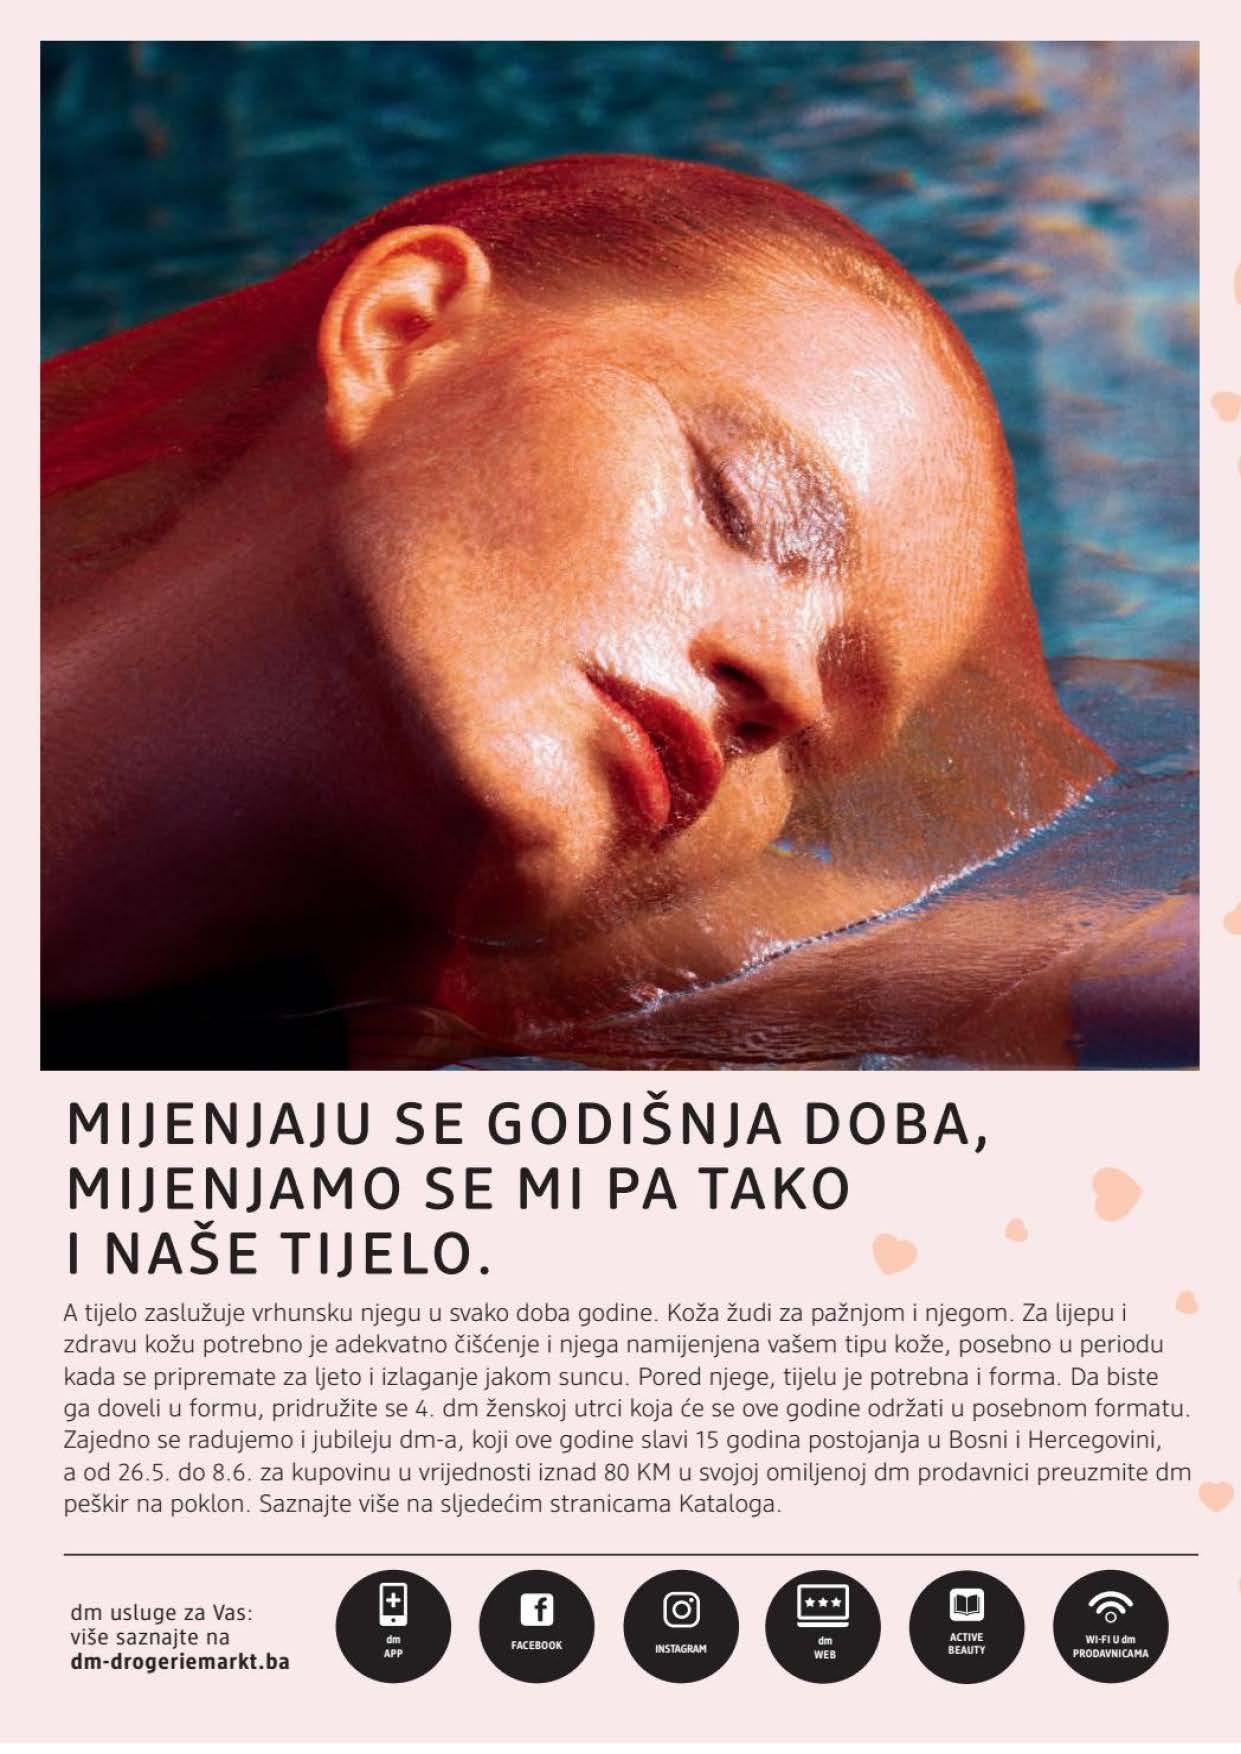 DM Katalog BiH Maj Jun 2021 26.05.2021. 08.06.2021. eKatalozi.com dm Page 02 1